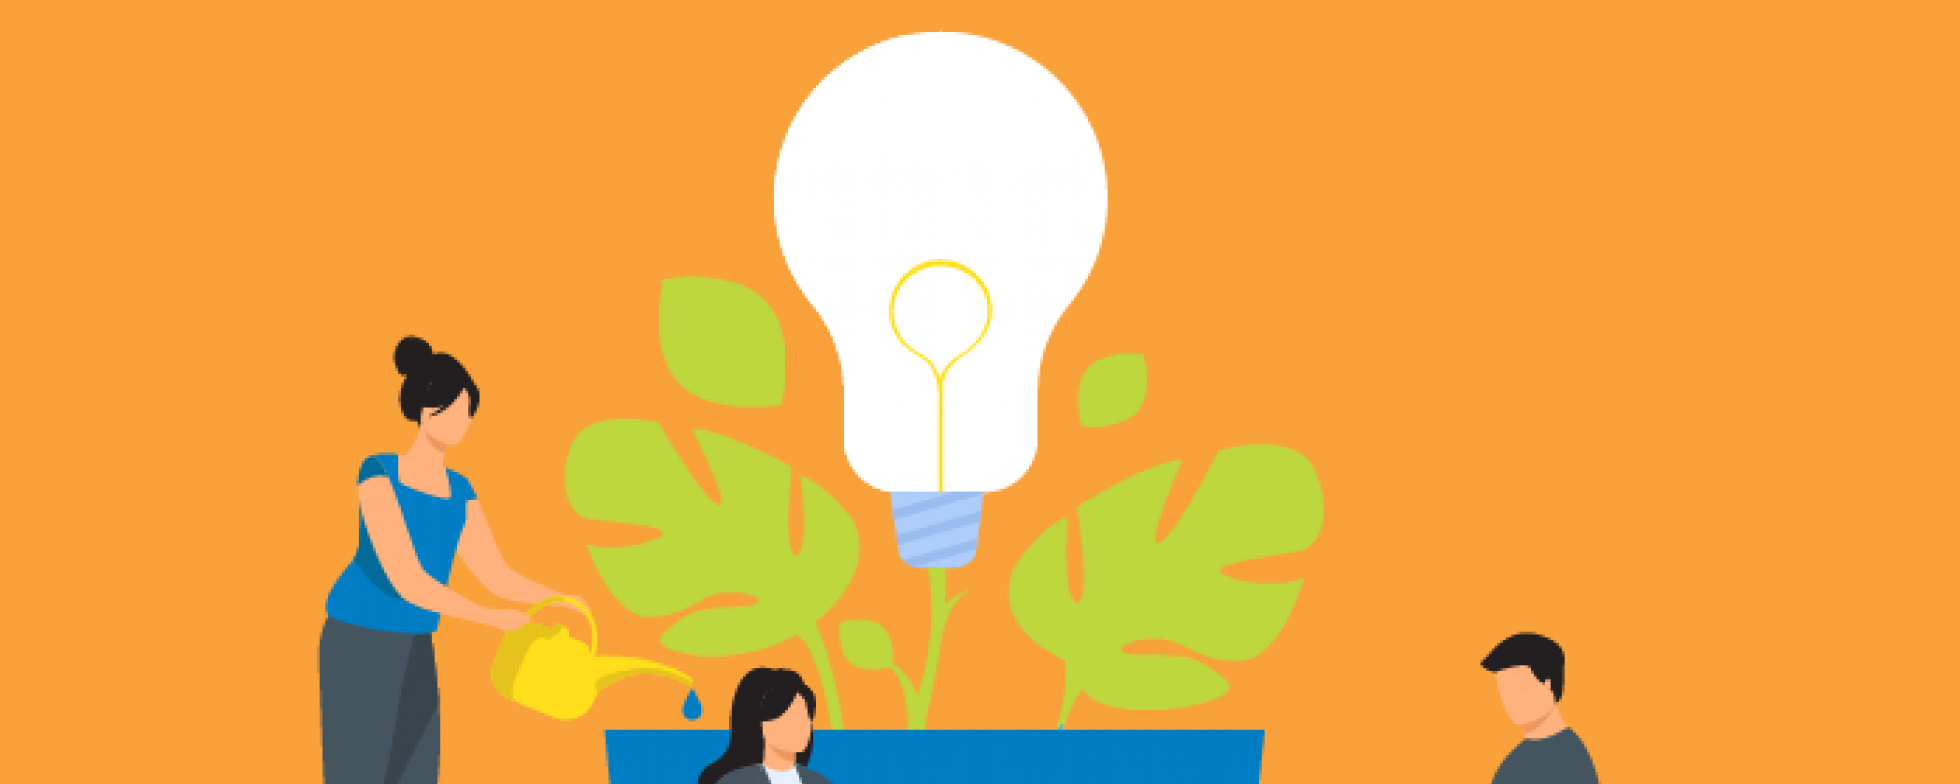 People growing a lightbulb idea in a planter